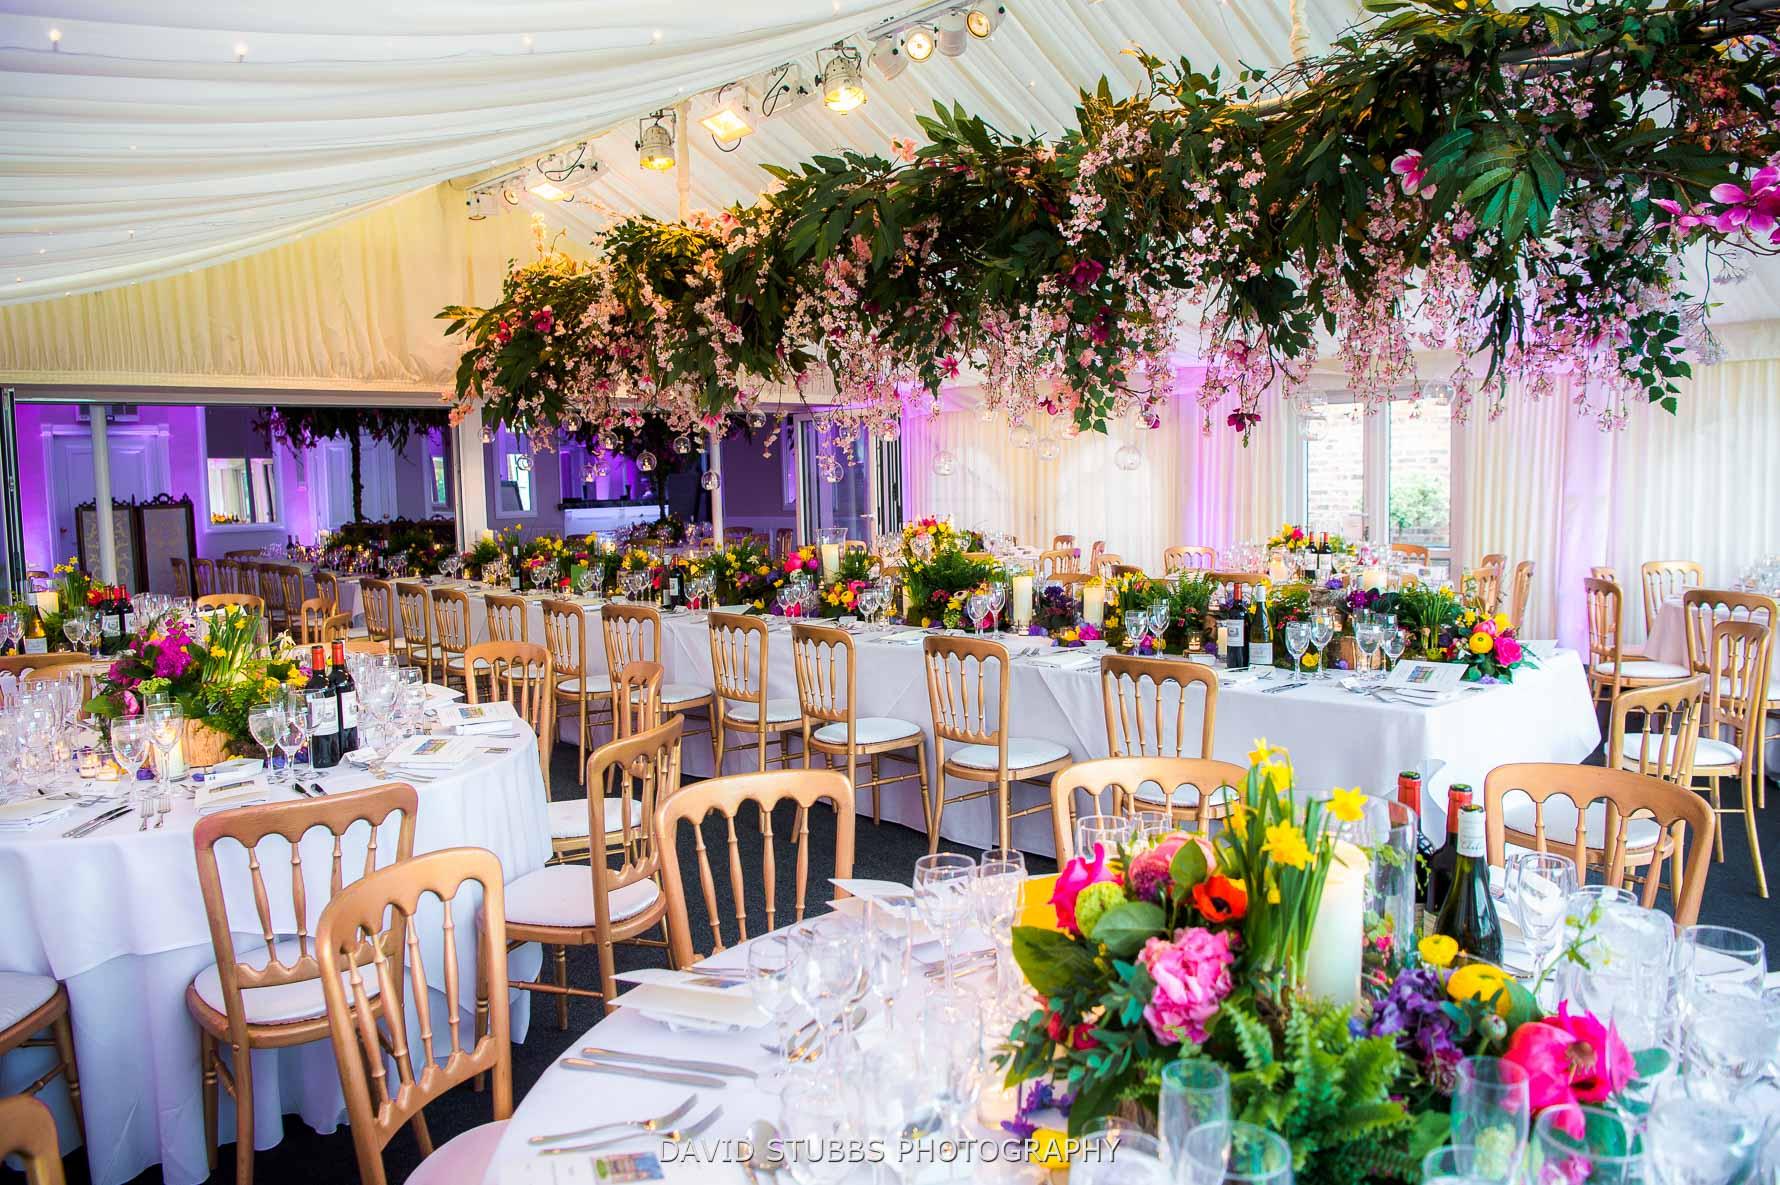 wedding breakfast room set-up with flowers